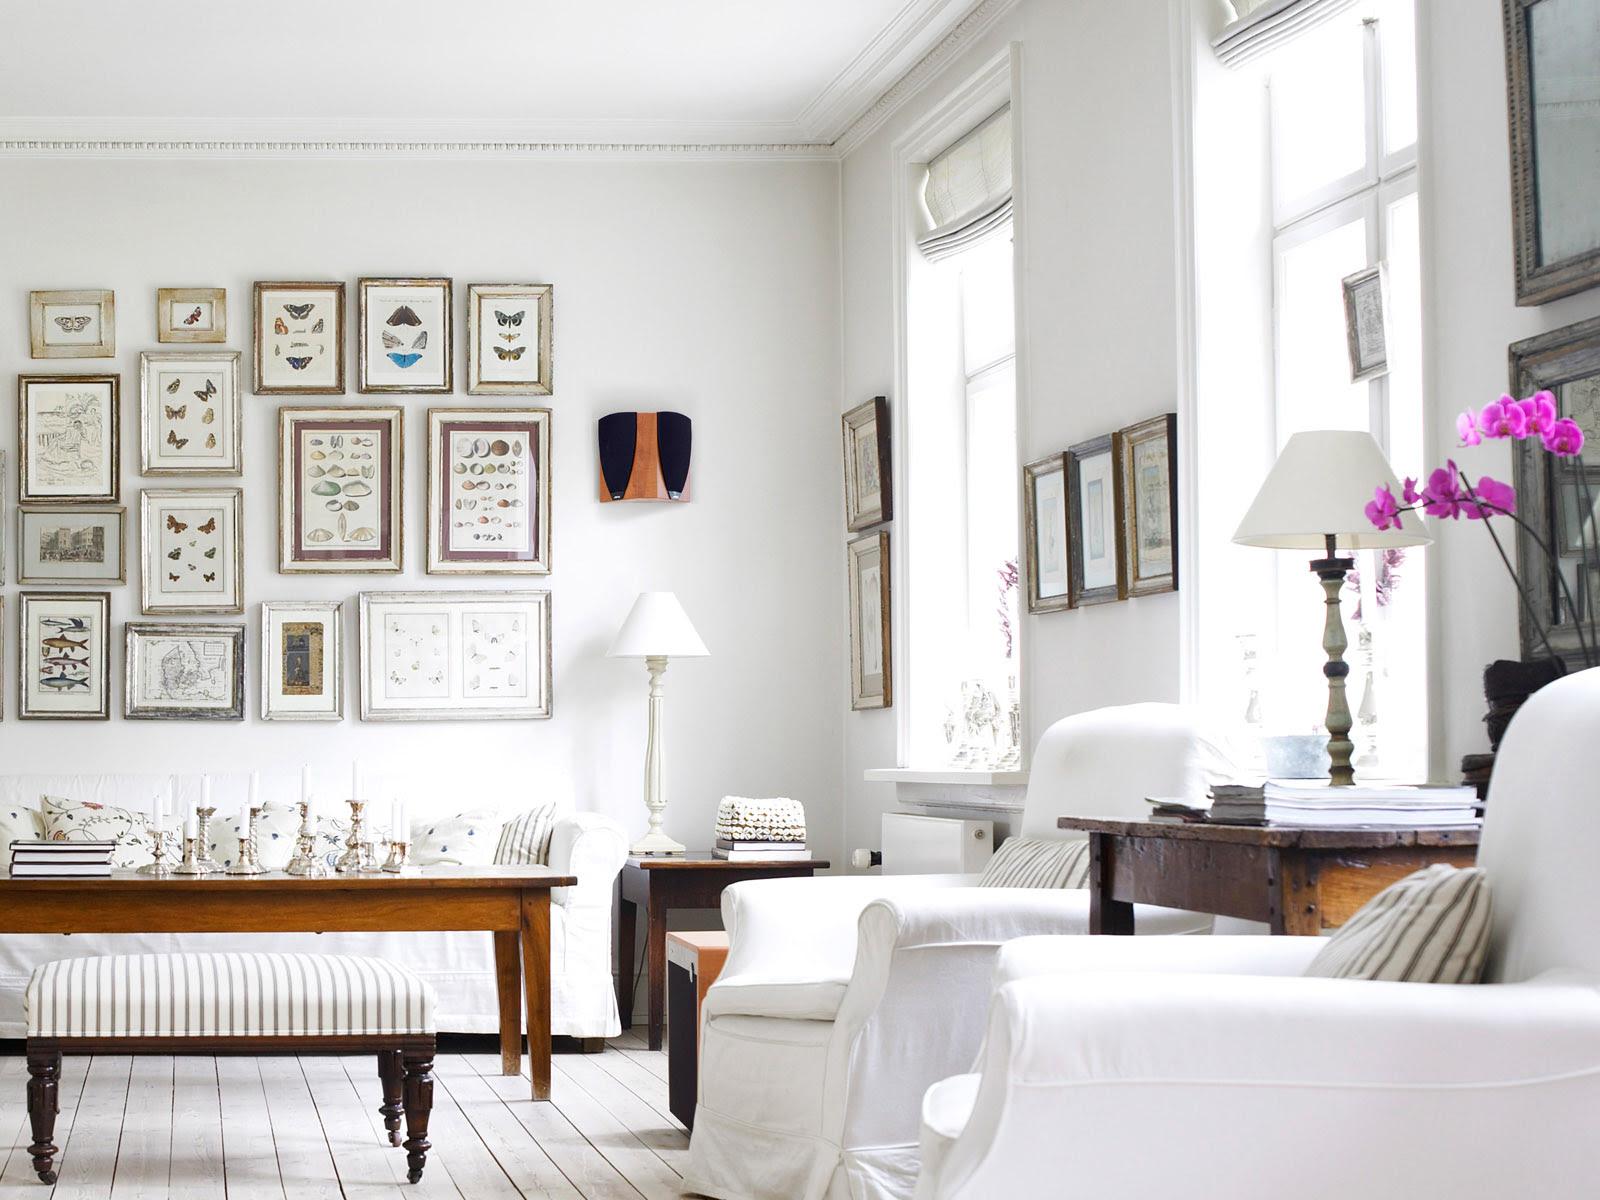 Small Home Interior Design – Interior Designing Ideas - Greene Greene Luna Guitars Blog